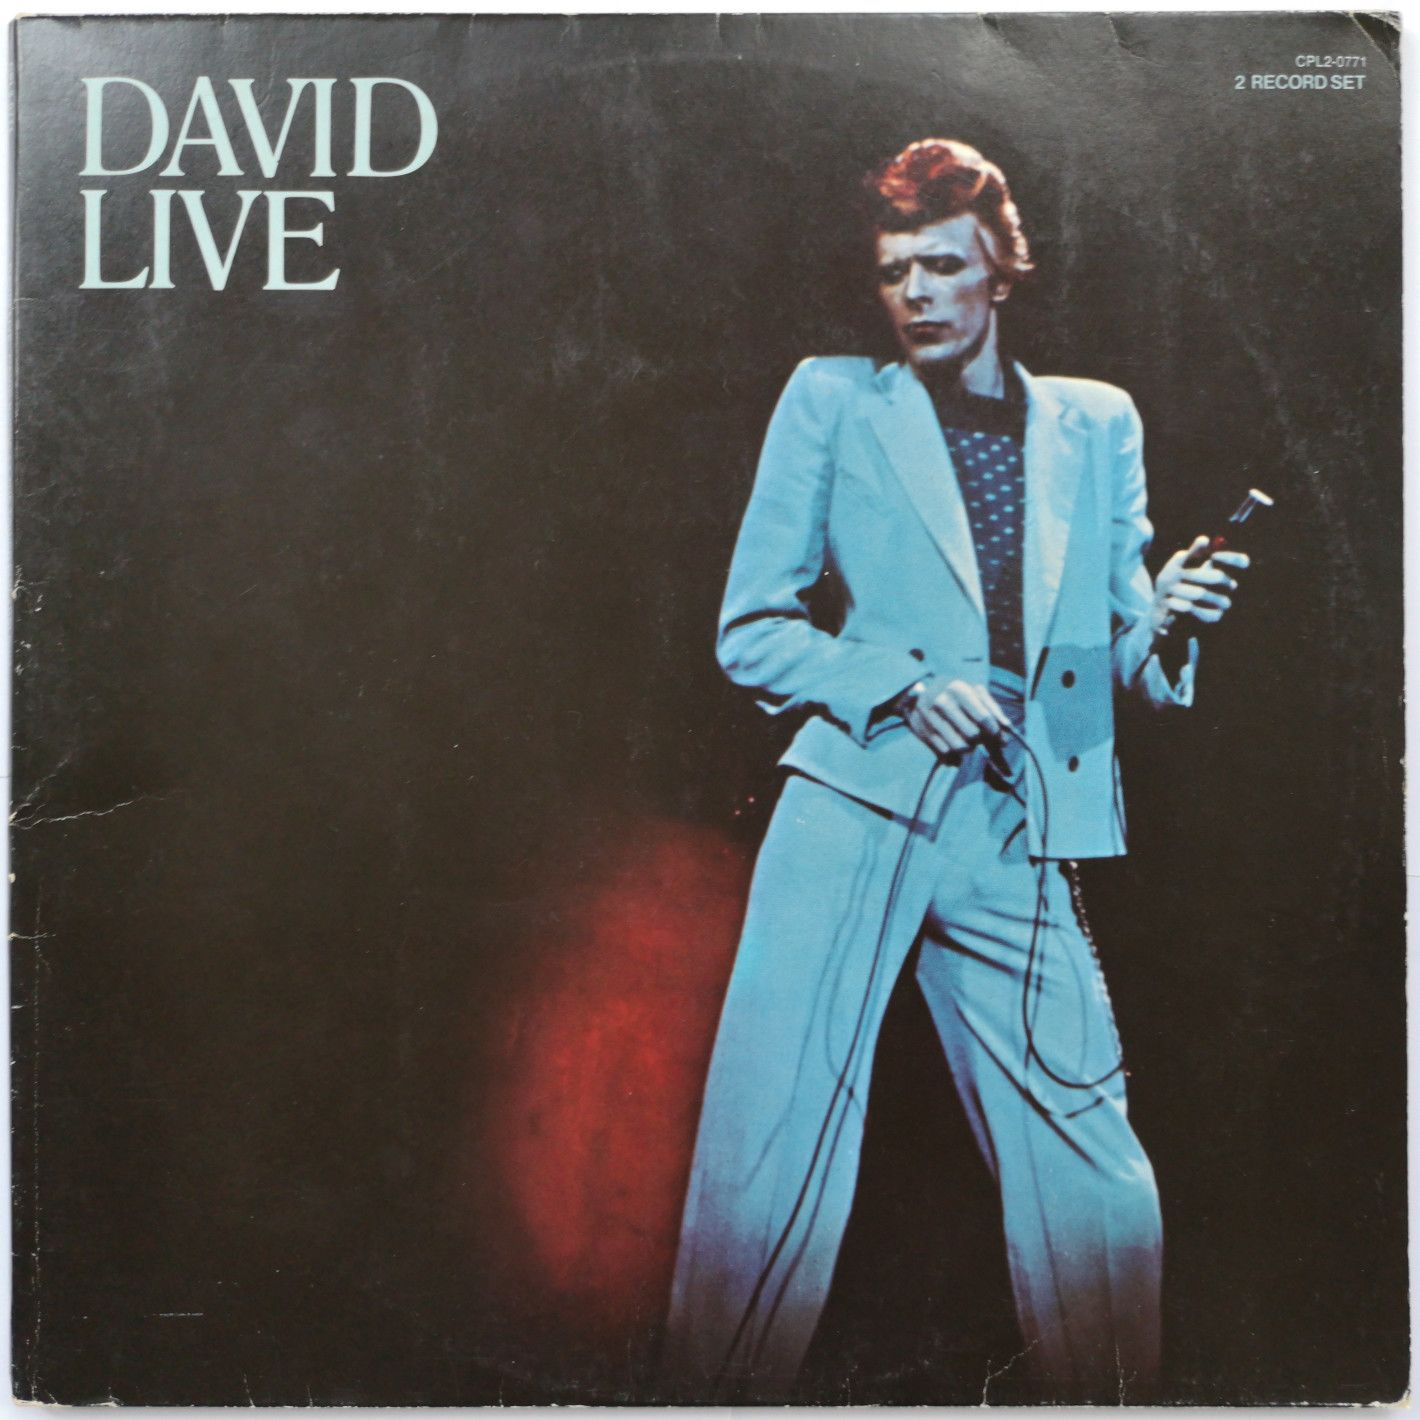 David Bowie David Live LP undefined